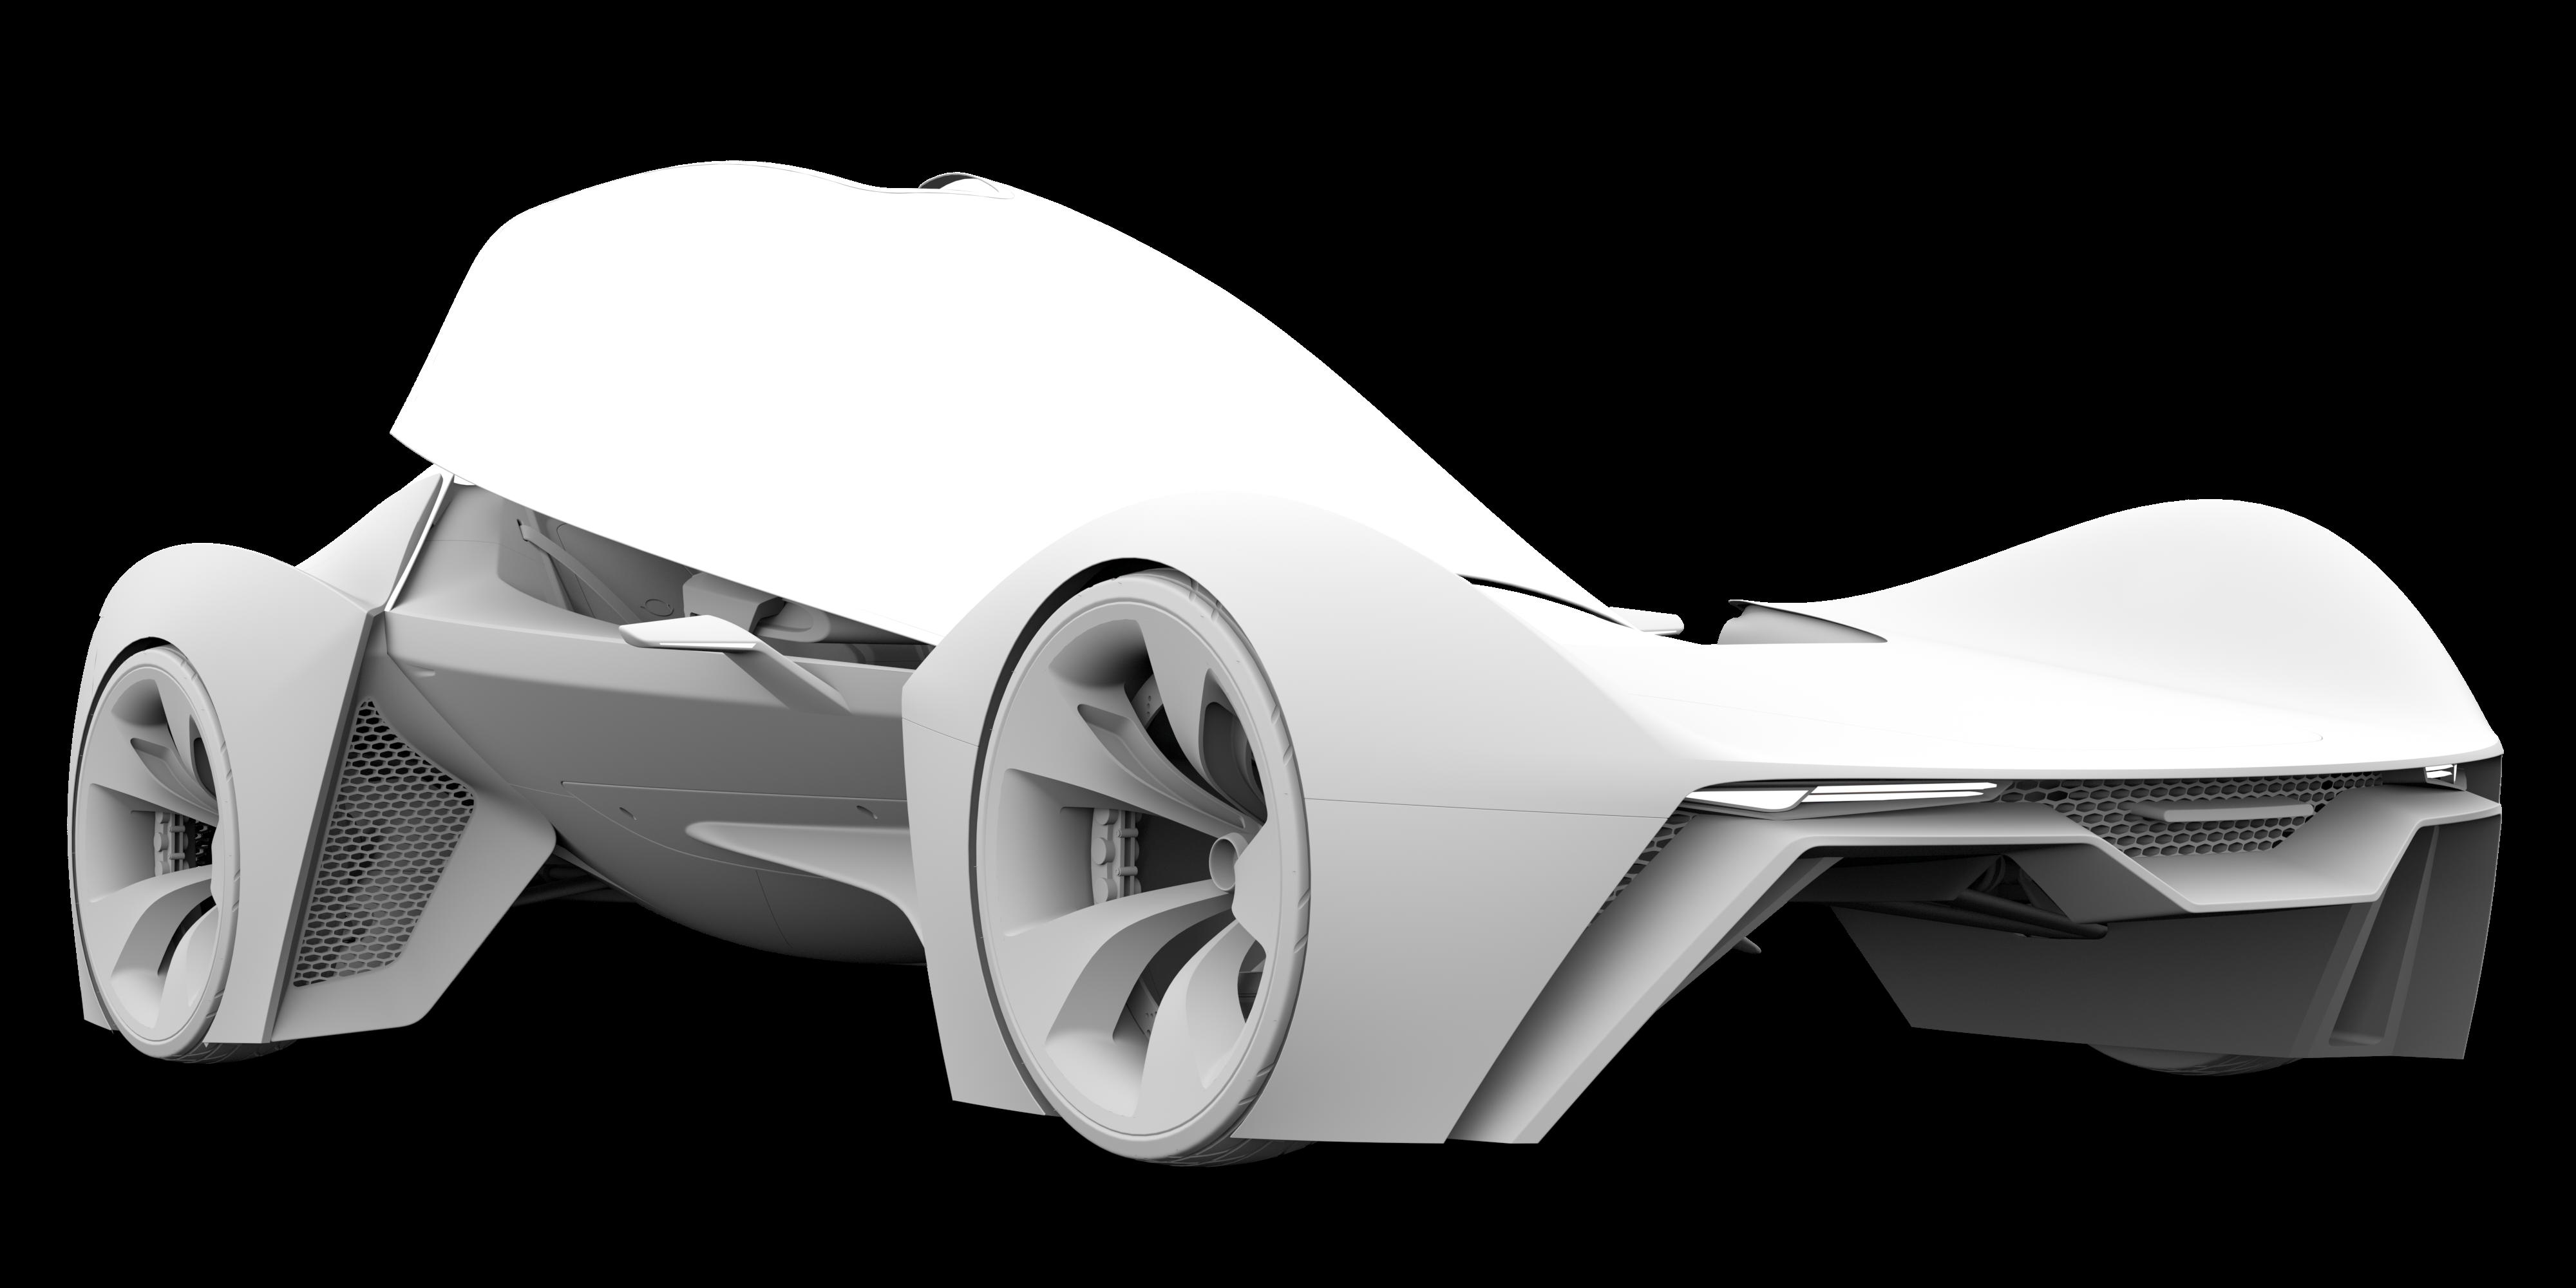 Personal Work Irisdesigns Ibook Ao Rendering Concept Cars Toy Car Car